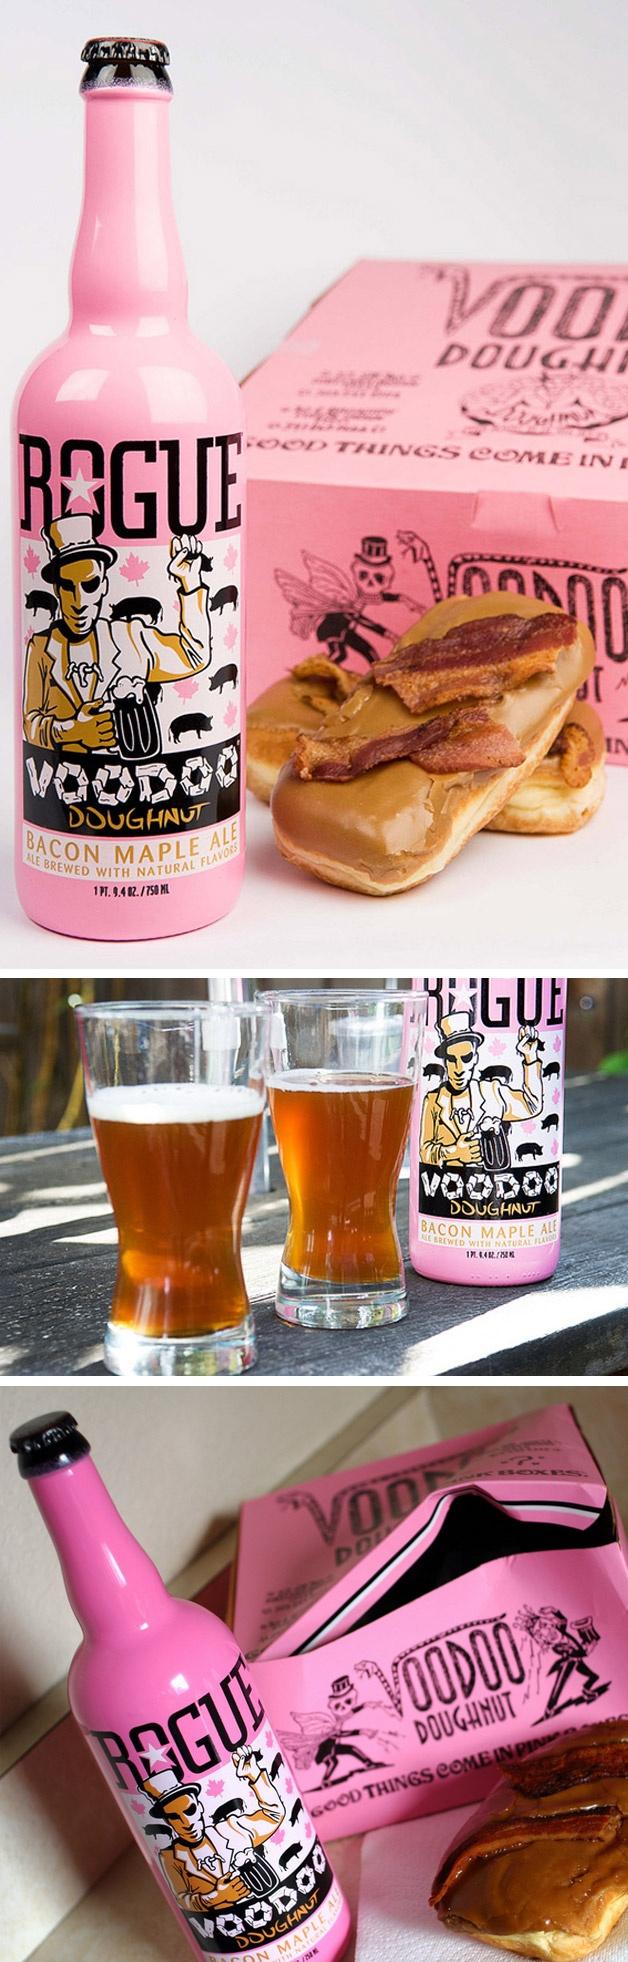 Cerveja sabor bacon. Estão servidos?: Voodoo Doughnuts, Doo Donuts, Creative Design Art Typography, Stuff, Voodoo Rogue, Gifts Fun Things, Voodoo Bacon, Voodoo Beer